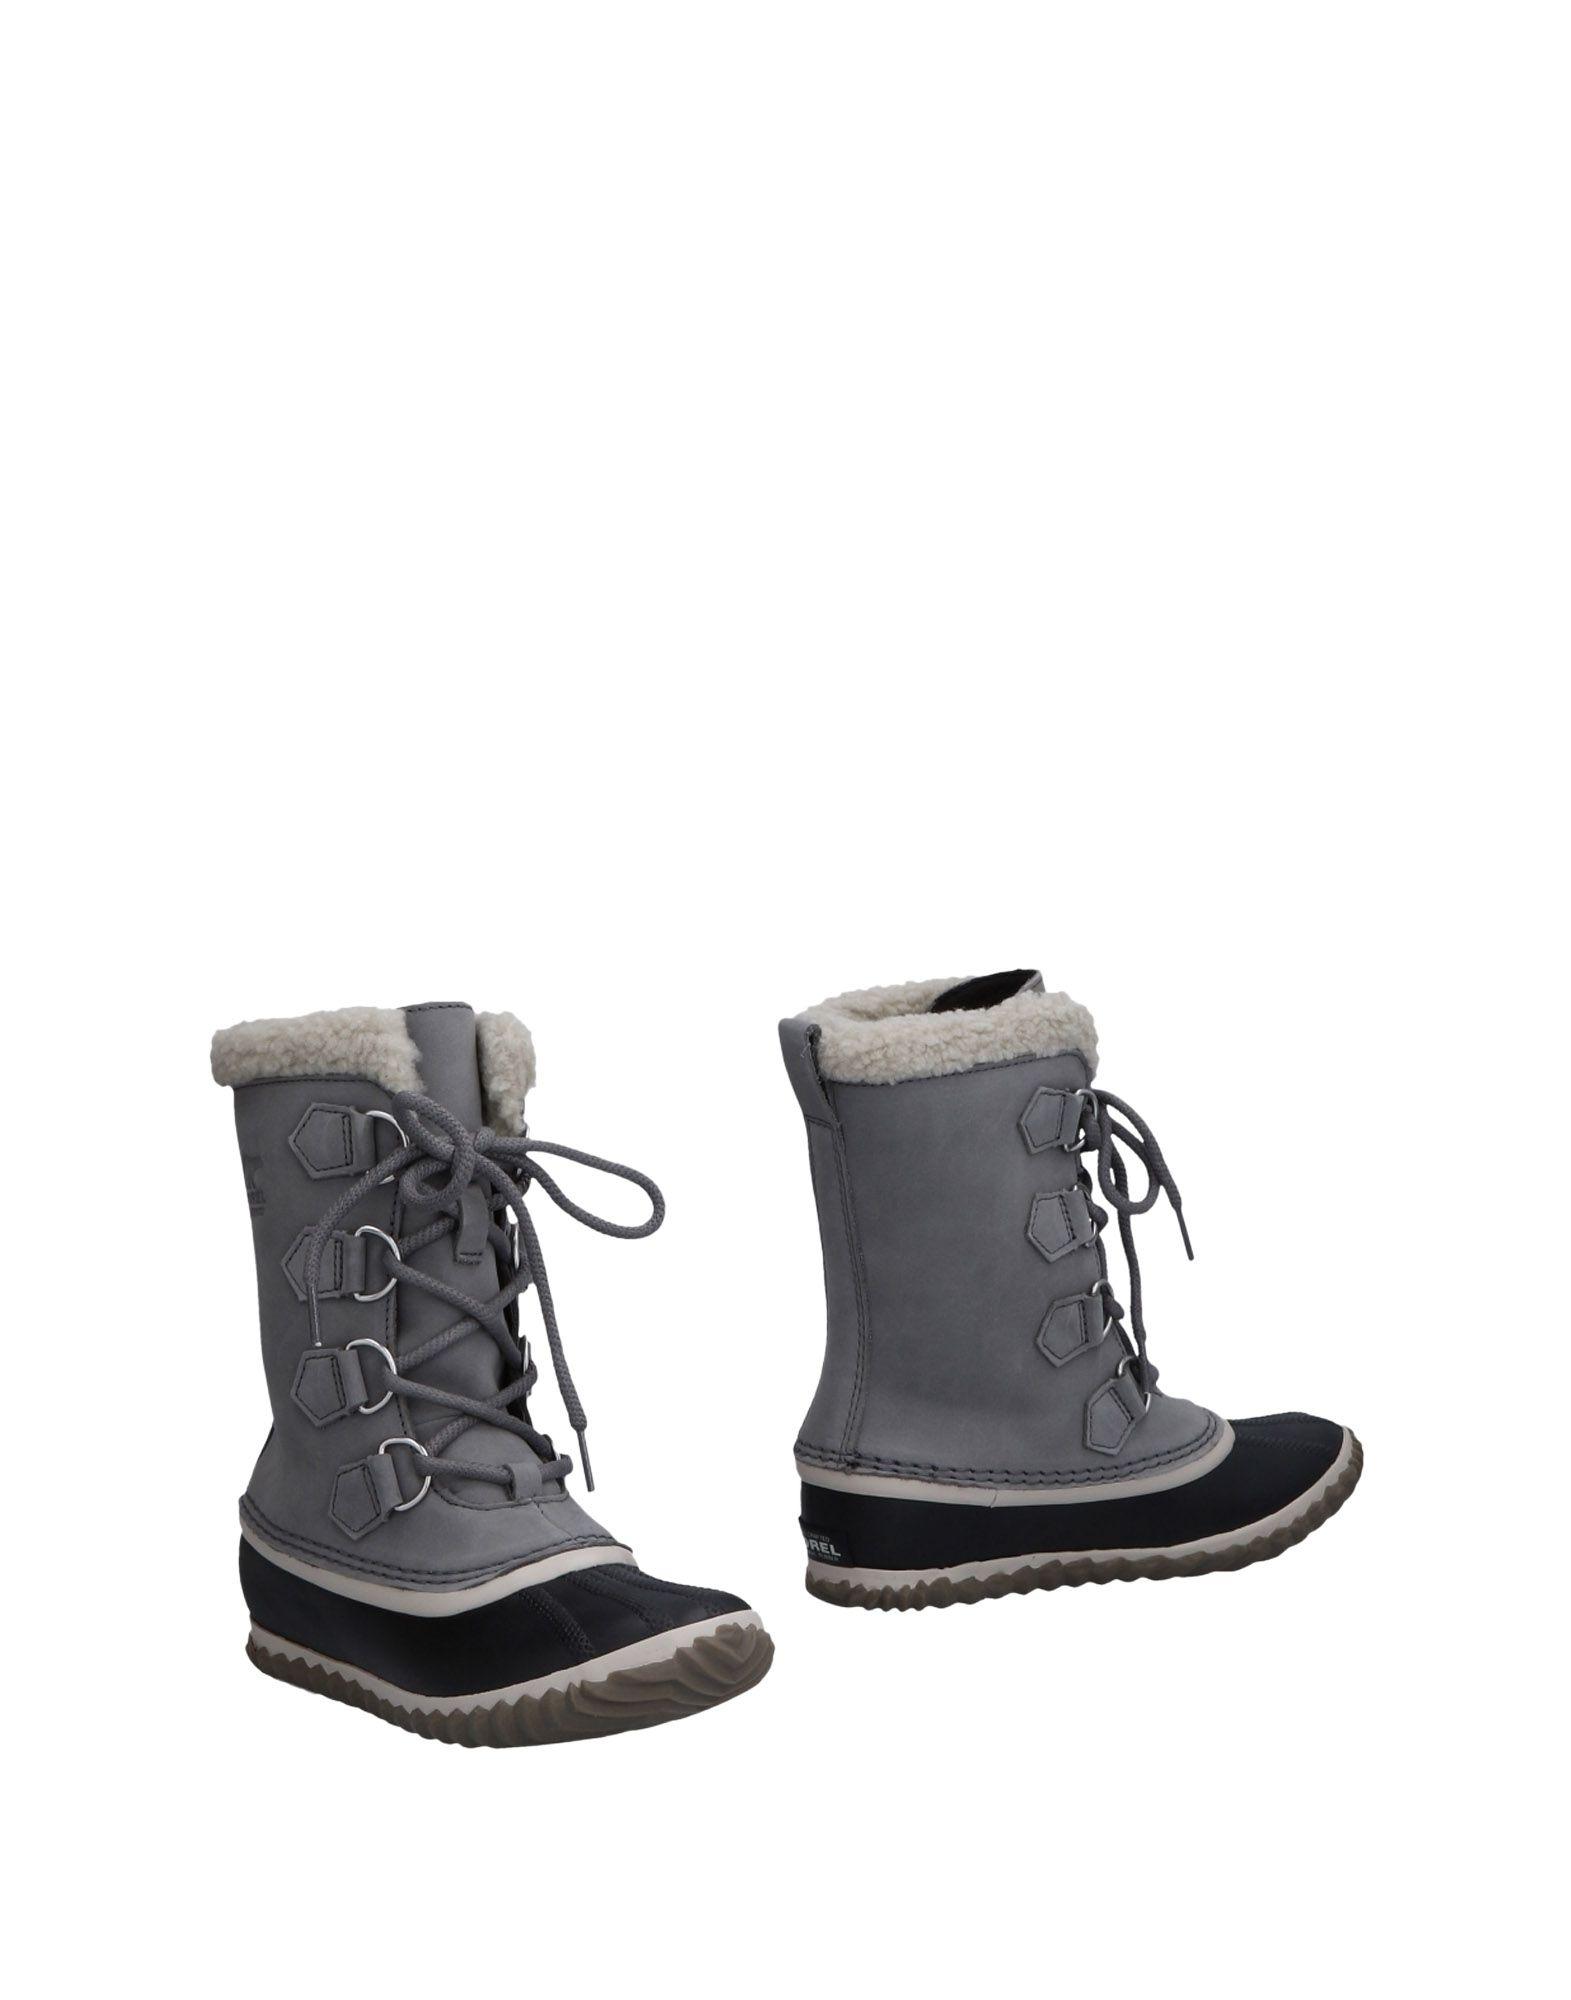 Sorel Stiefelette Damen  11478694JX beliebte Gute Qualität beliebte 11478694JX Schuhe d306fa